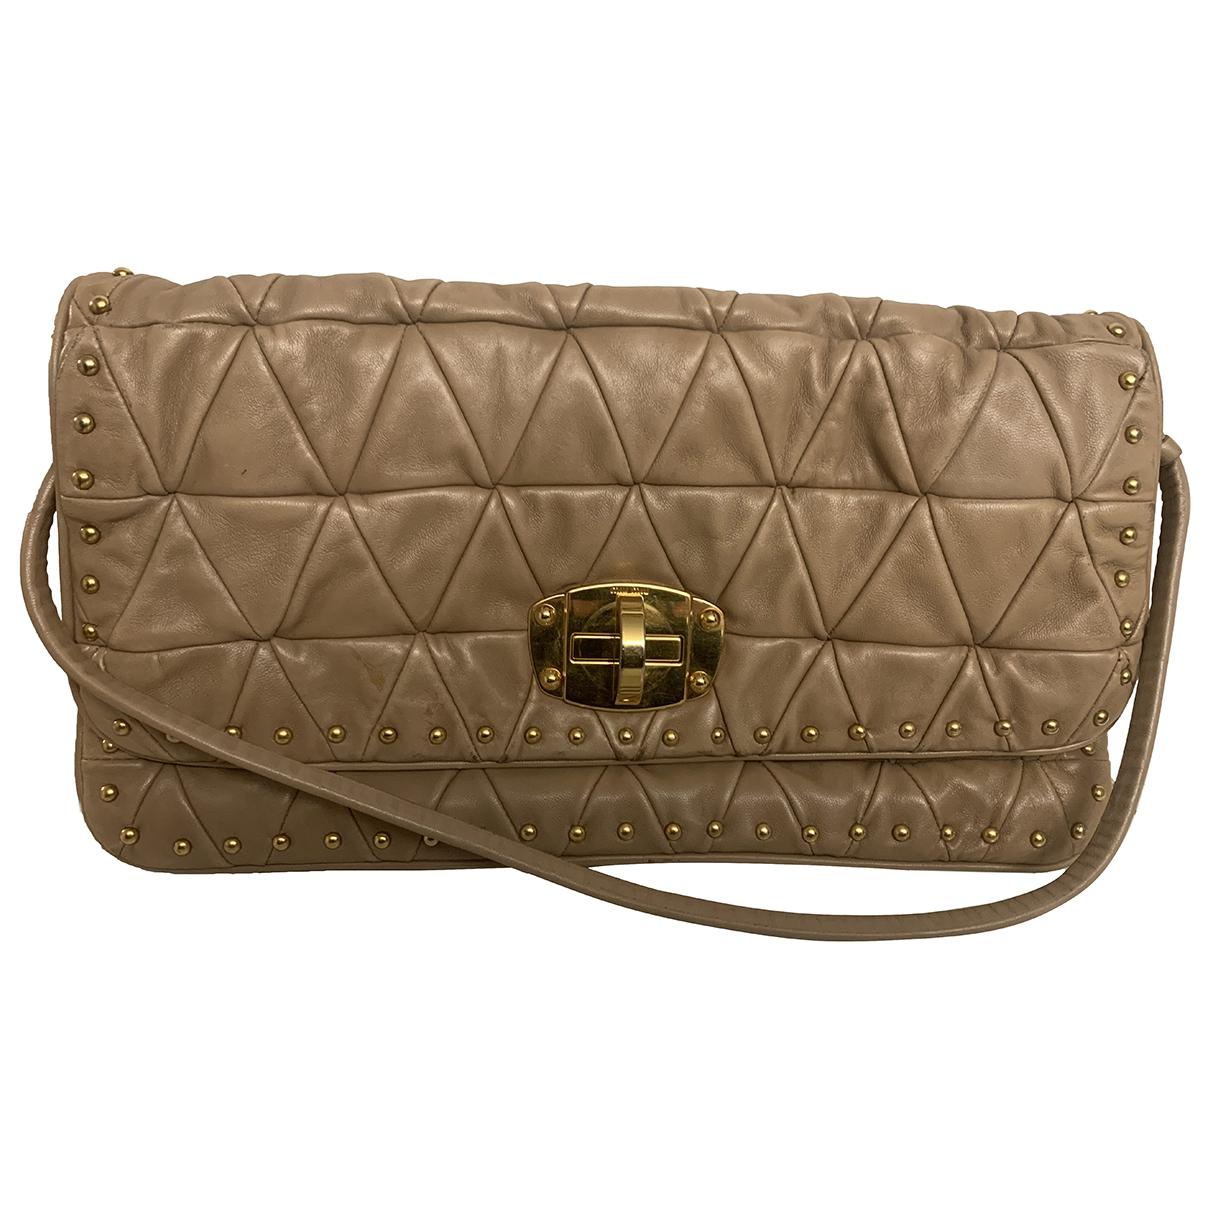 Miu Miu \N Beige Leather Clutch bag for Women \N